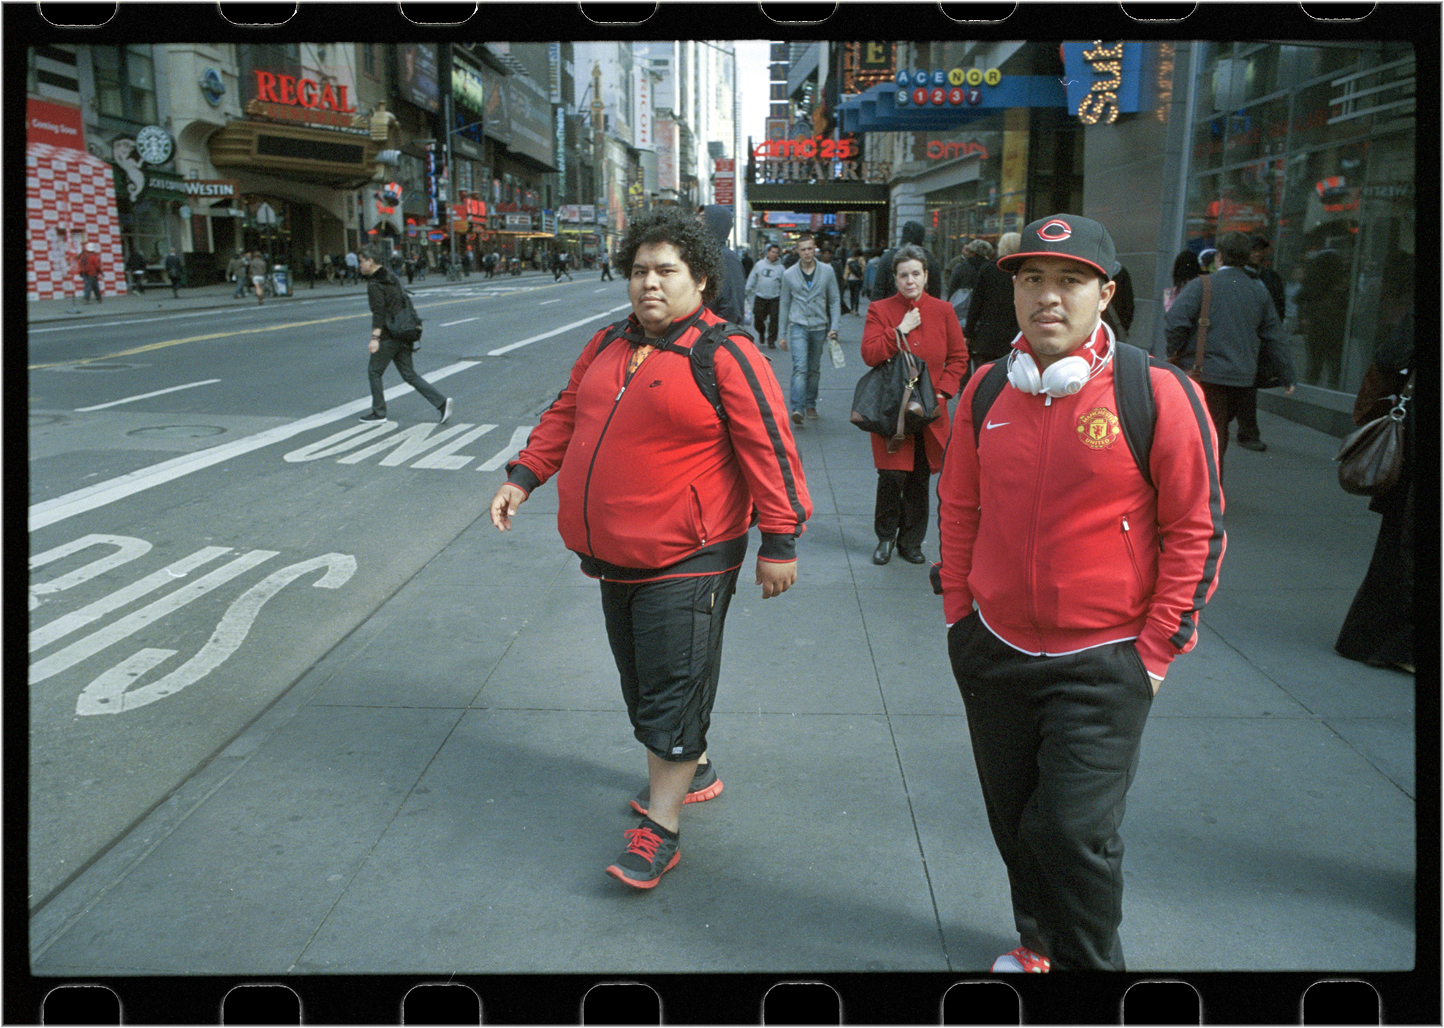 RED-42dStreet-2012 copy